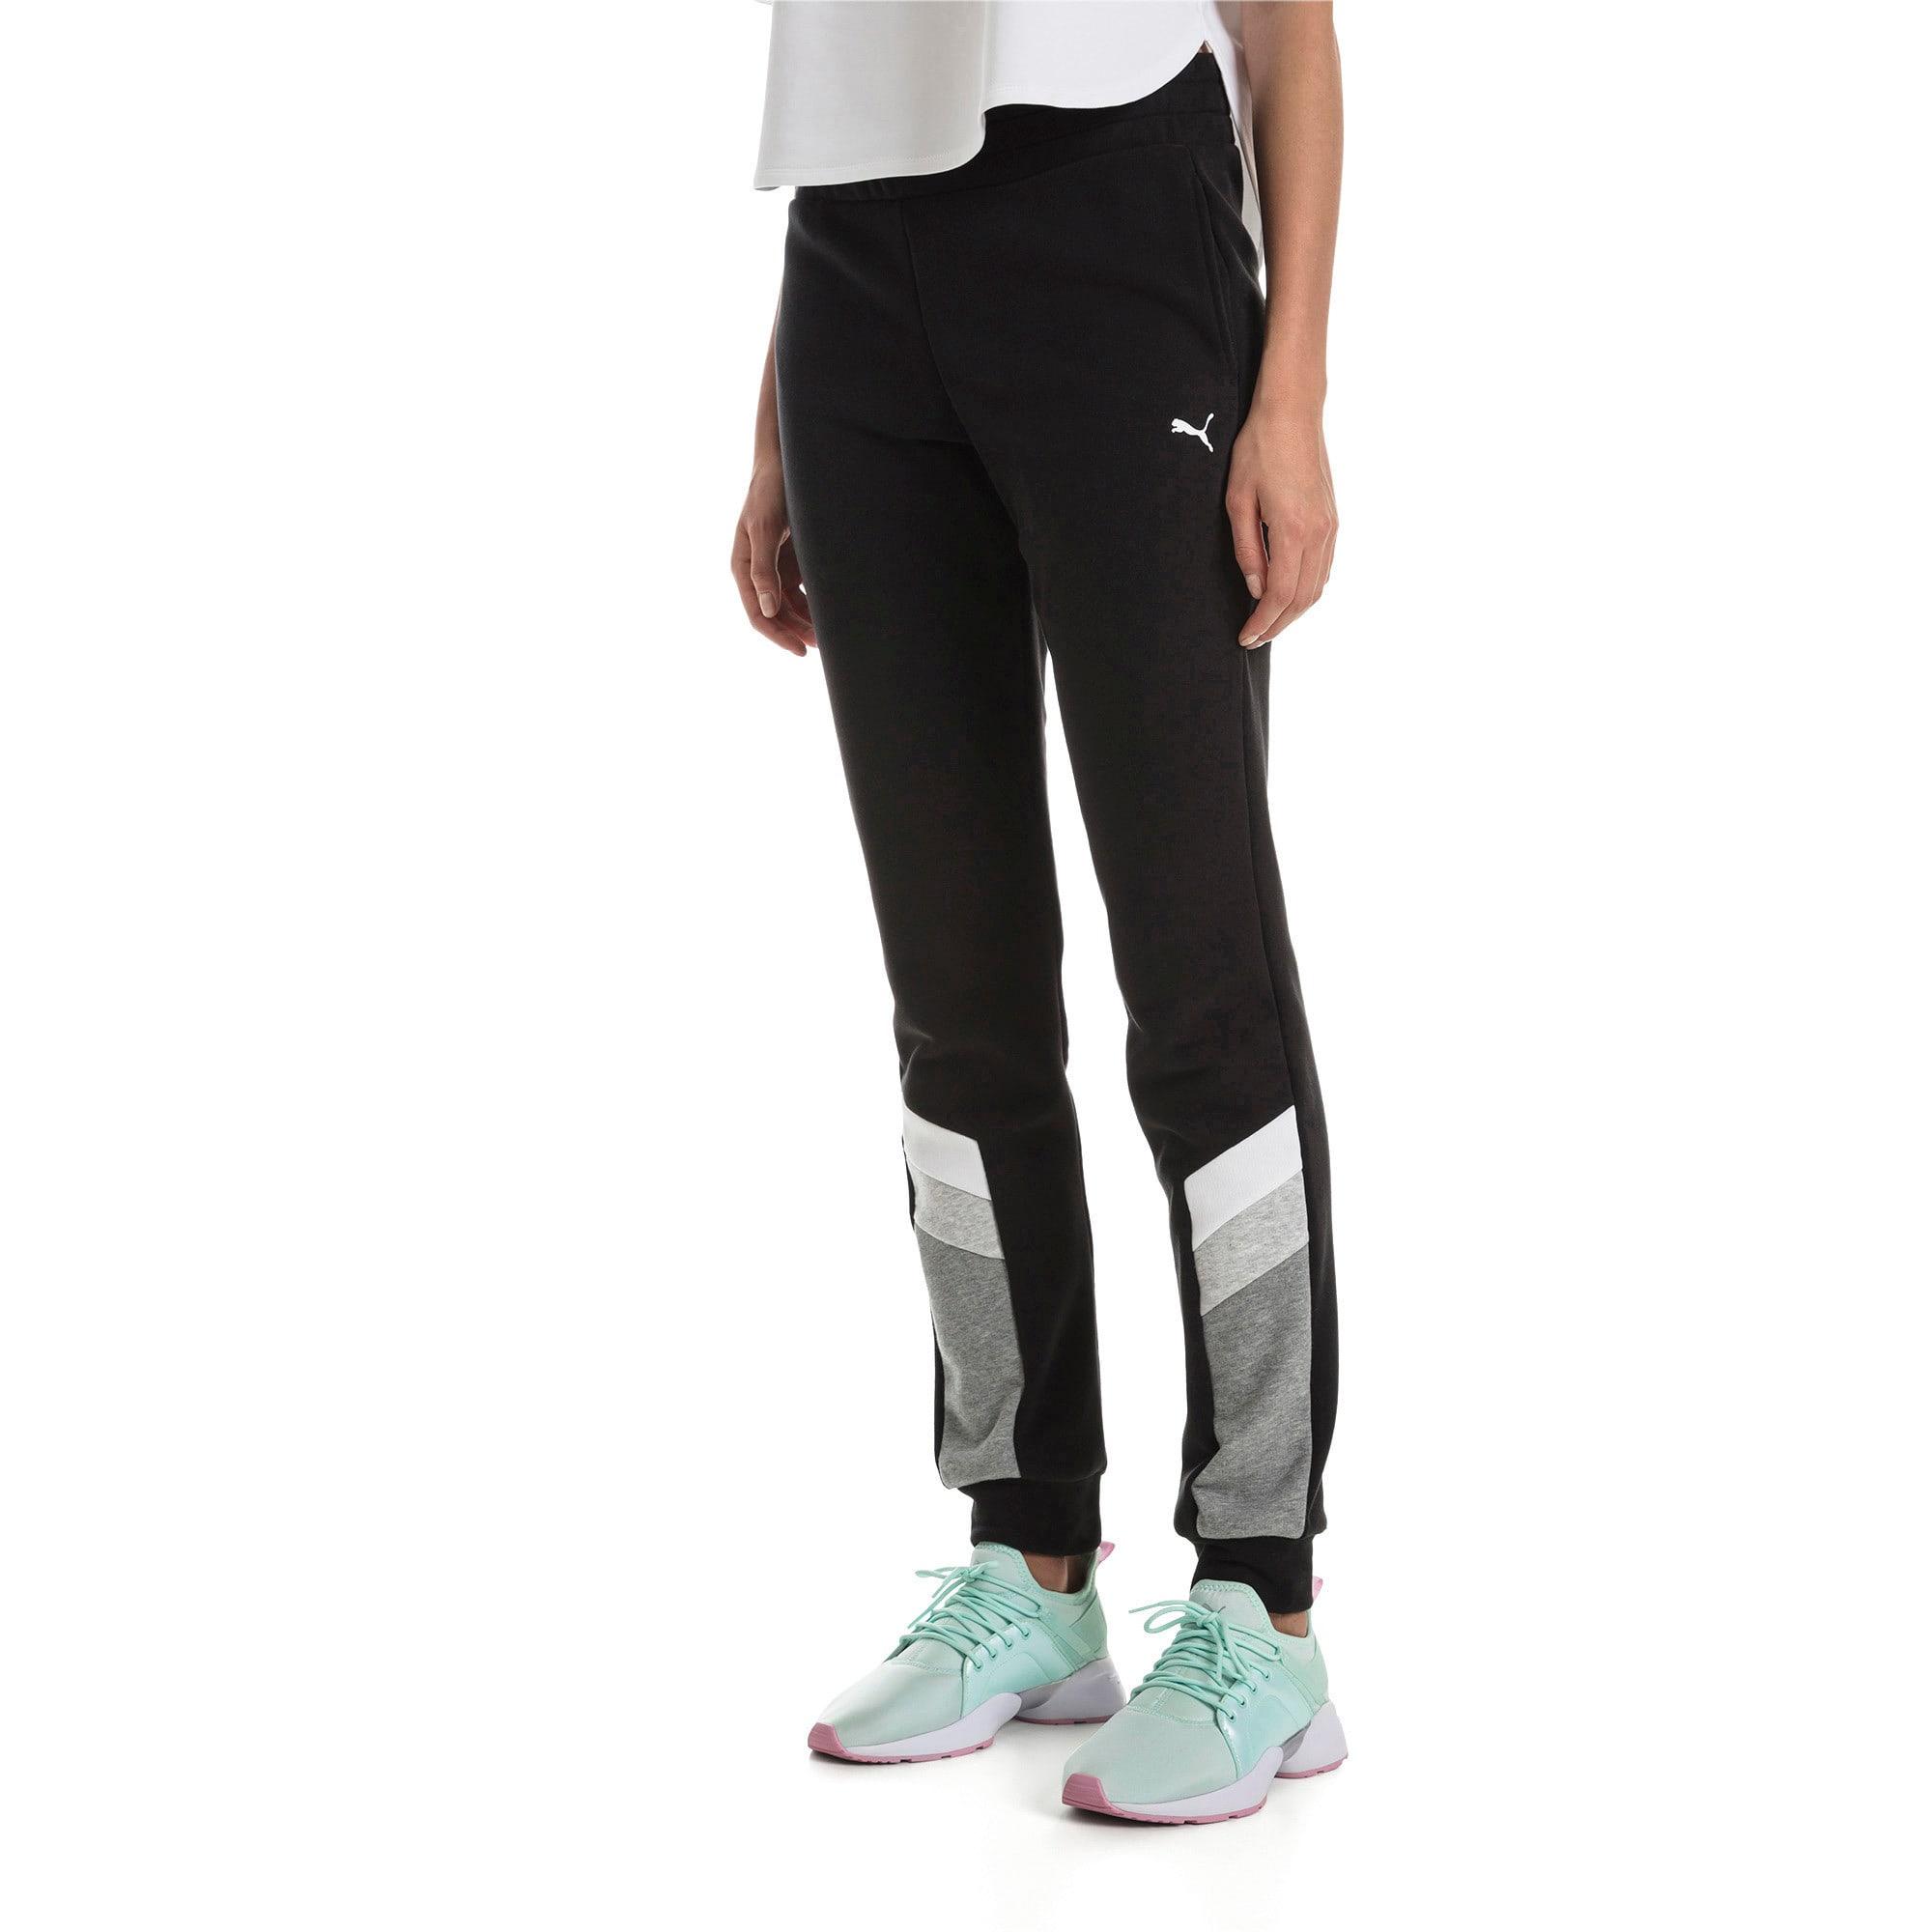 Thumbnail 1 of Athletics Women's Sweatpants, Cotton Black, medium